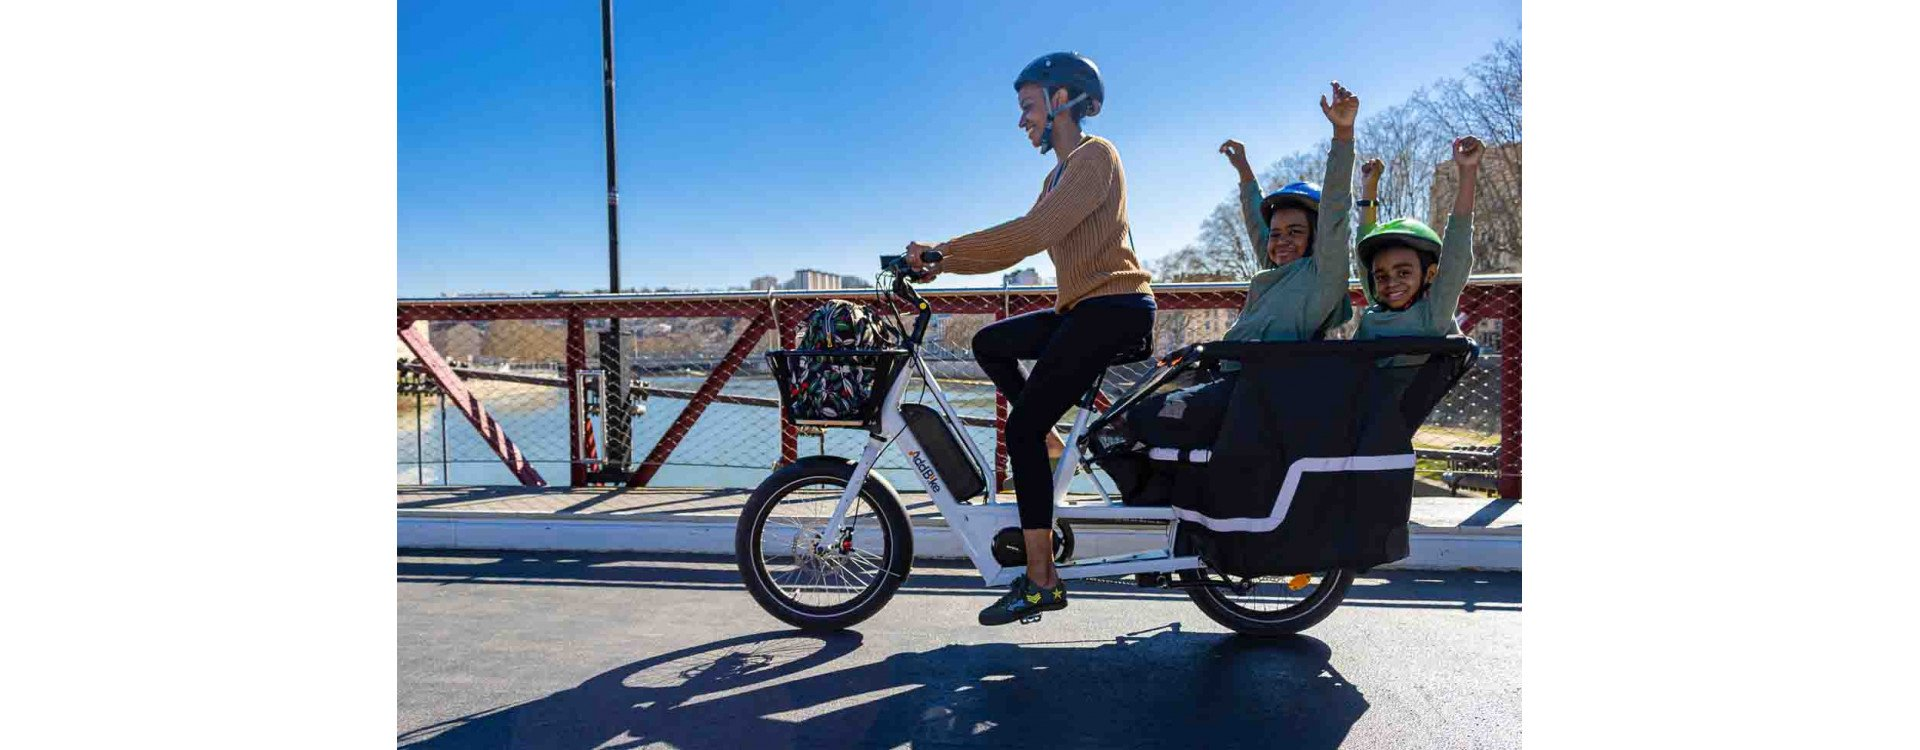 Cargo bike: The new practical bike solution?